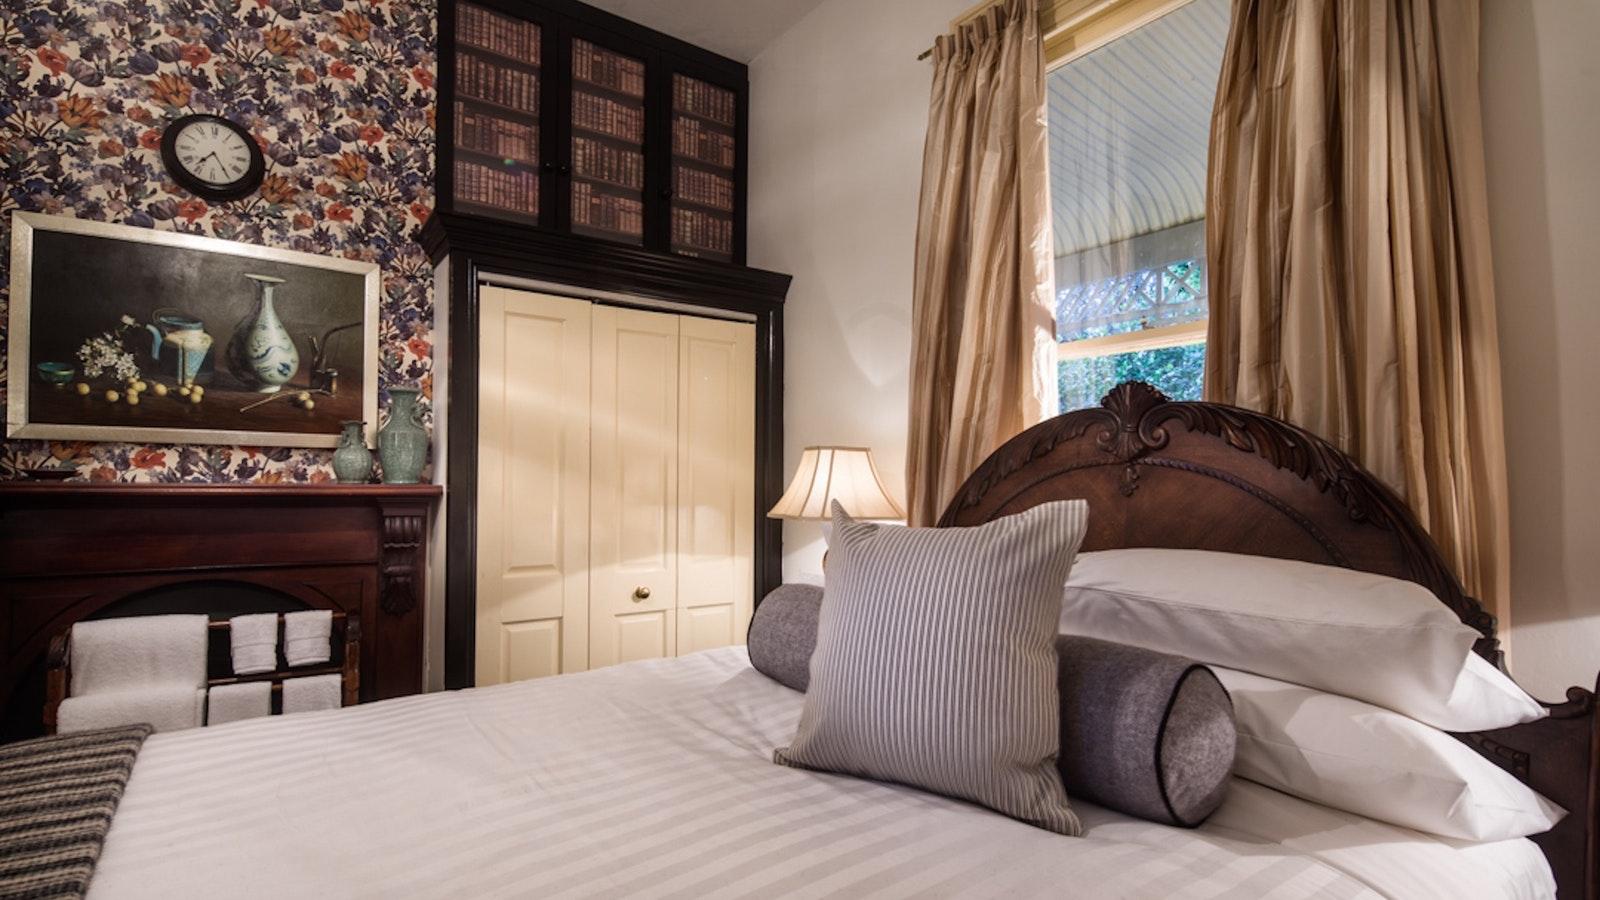 Kabay Queen bedroom at Holyrood